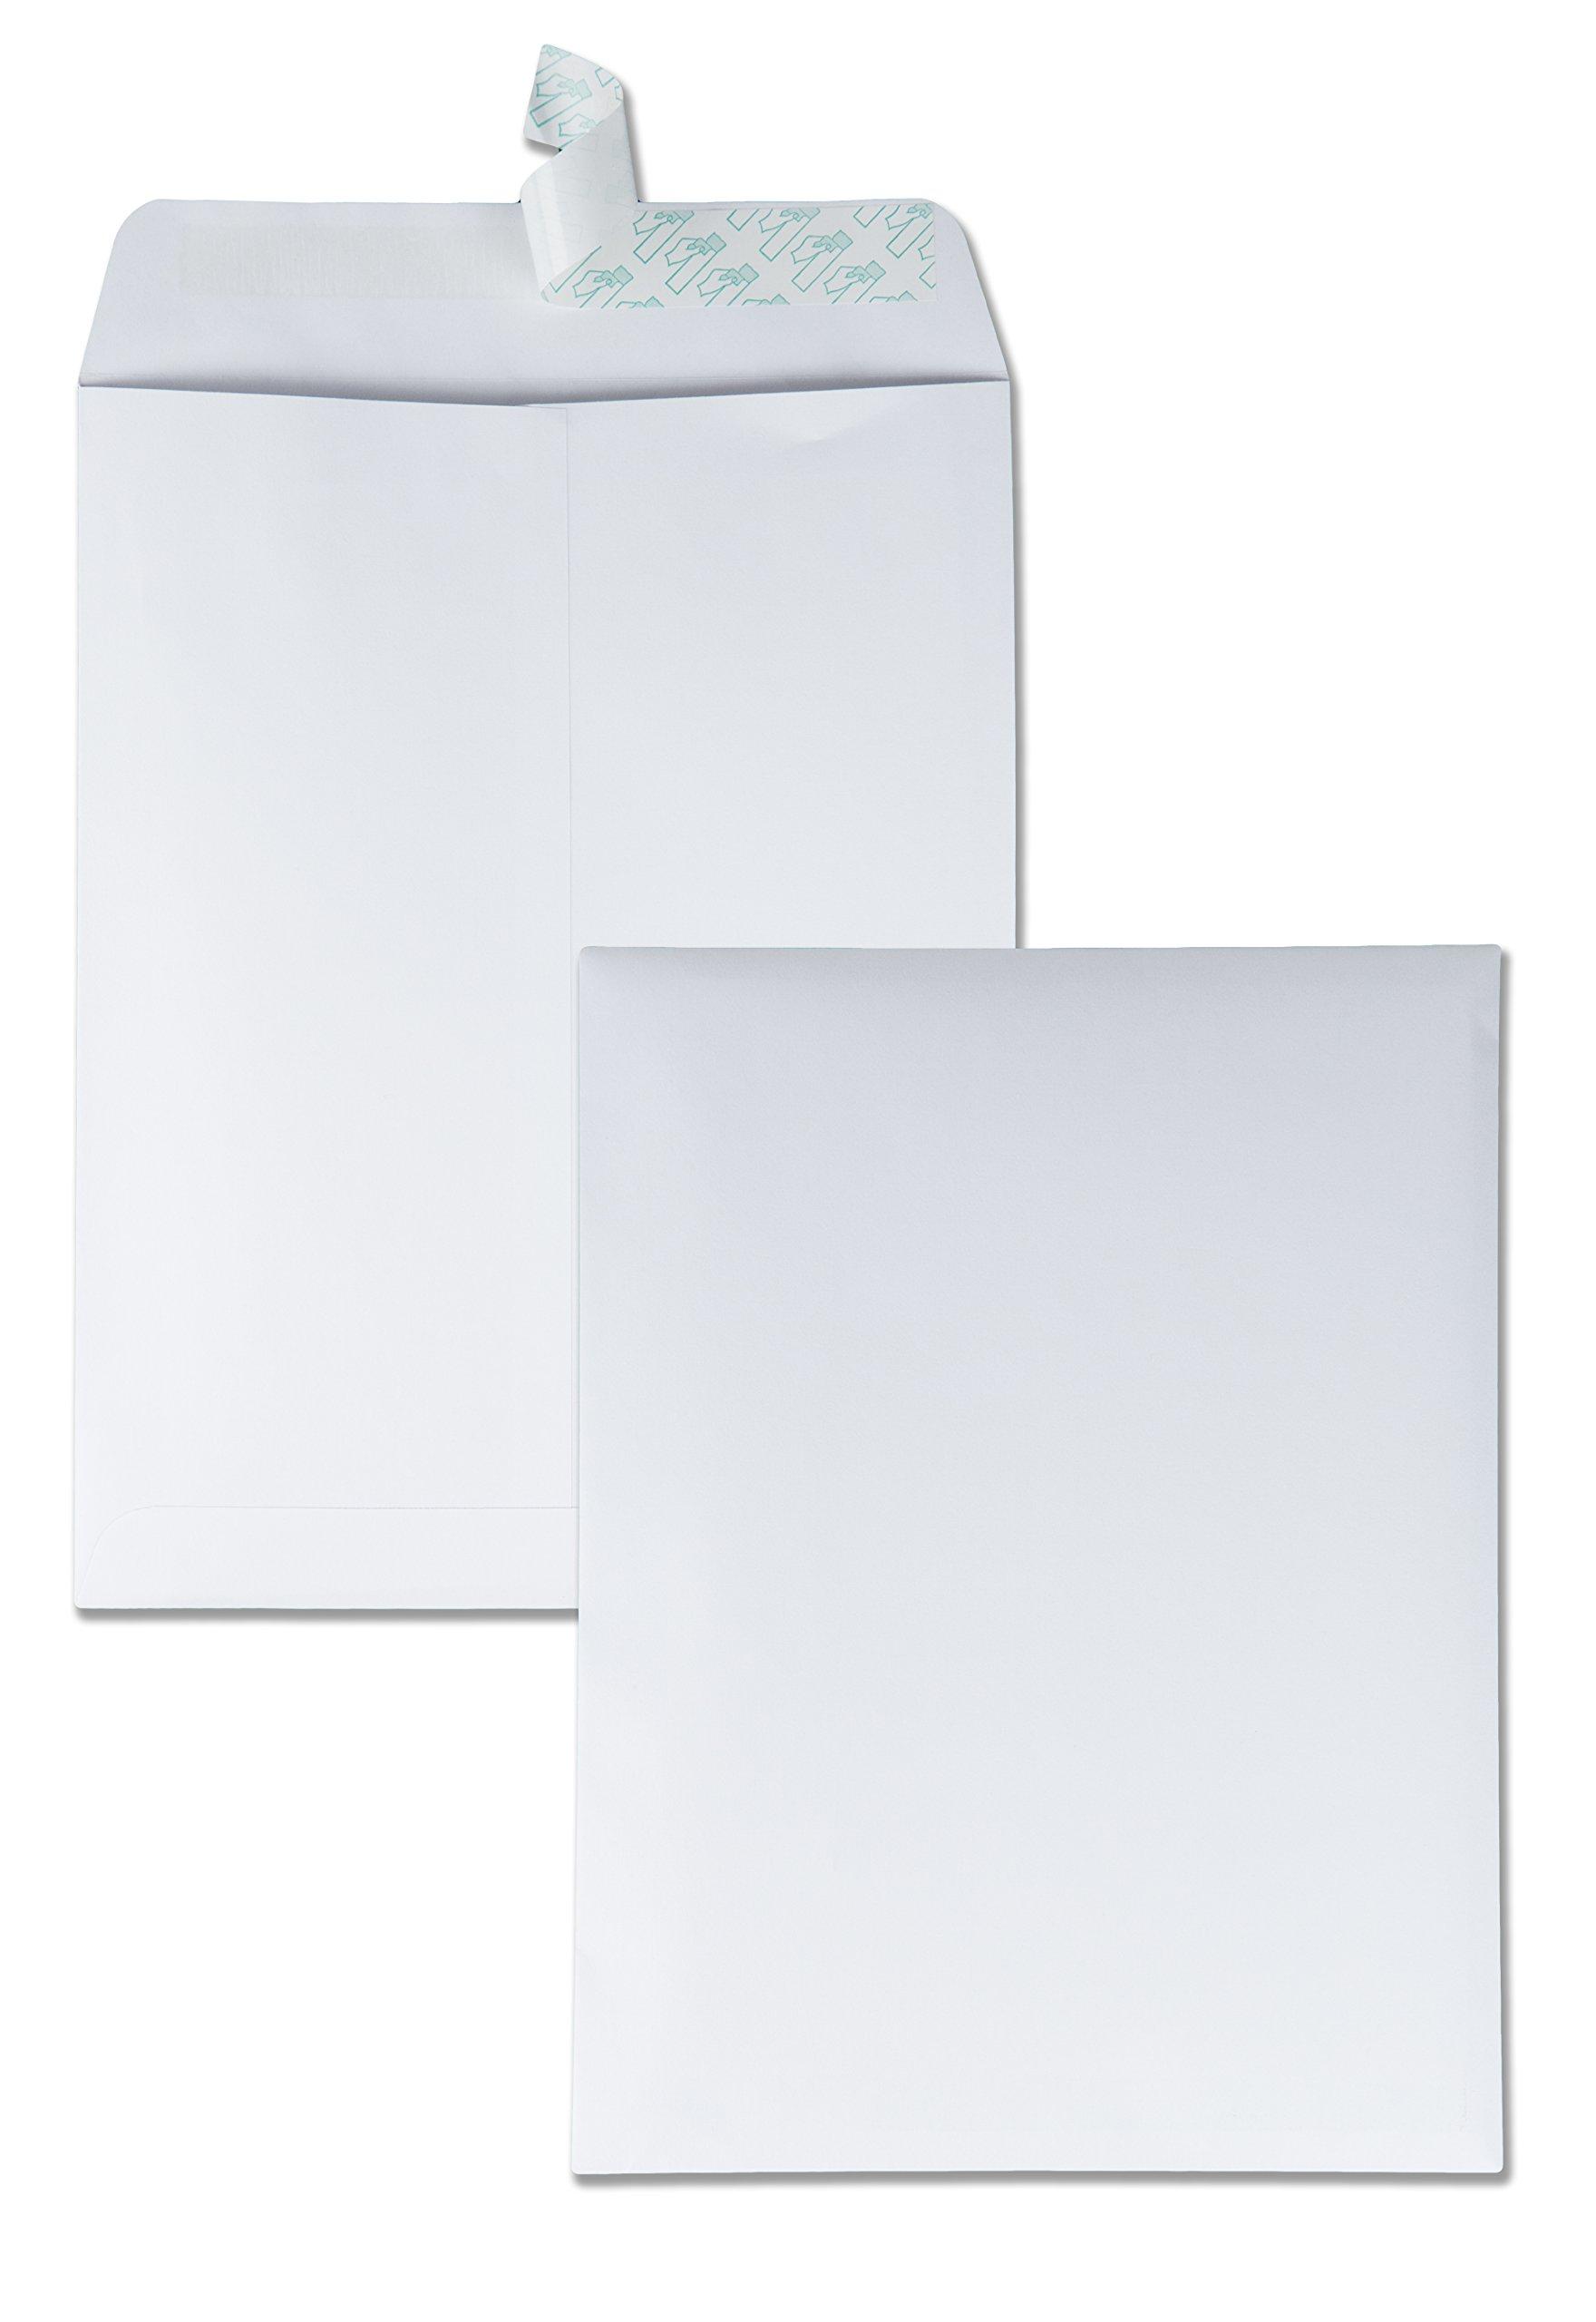 Quality Park 44682 Quality Park Redi-Strip Catalog Envelopes, 9-1/2x12-1/2, 28lb, White, 100/Box